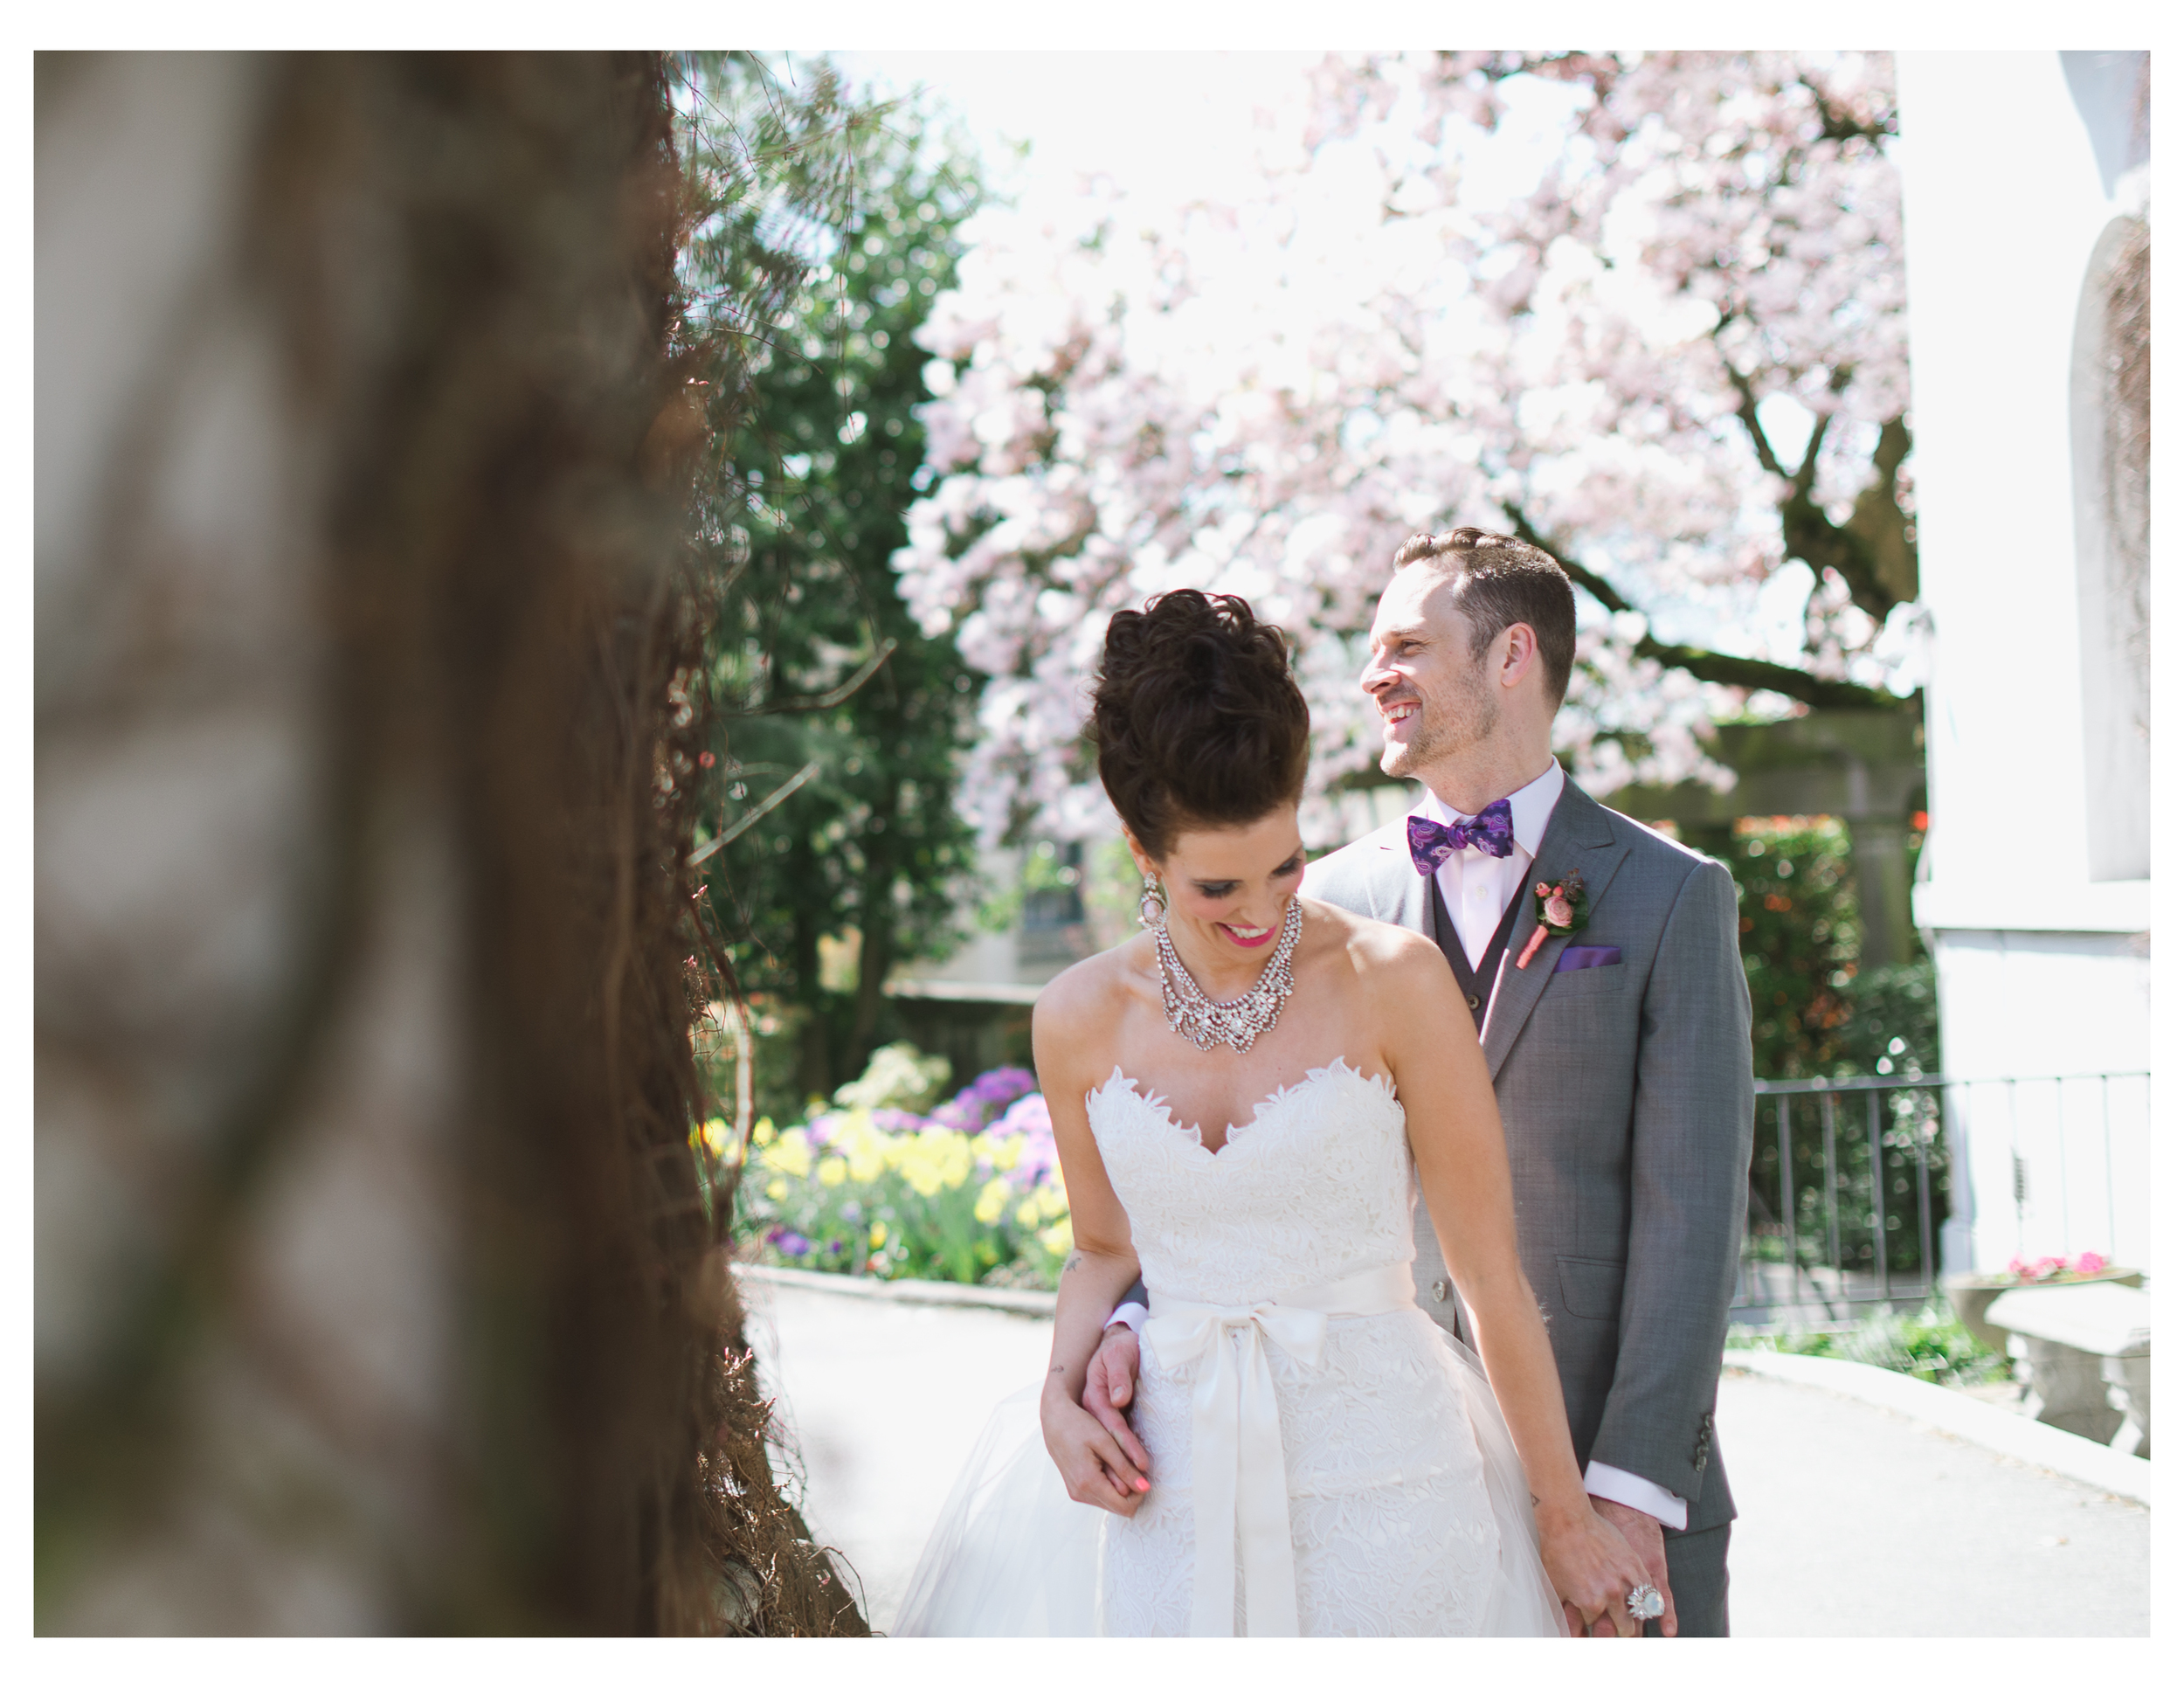 3 Katie Powell Photography_Vancouver_Wedding_Hycroft Manor-4.jpg